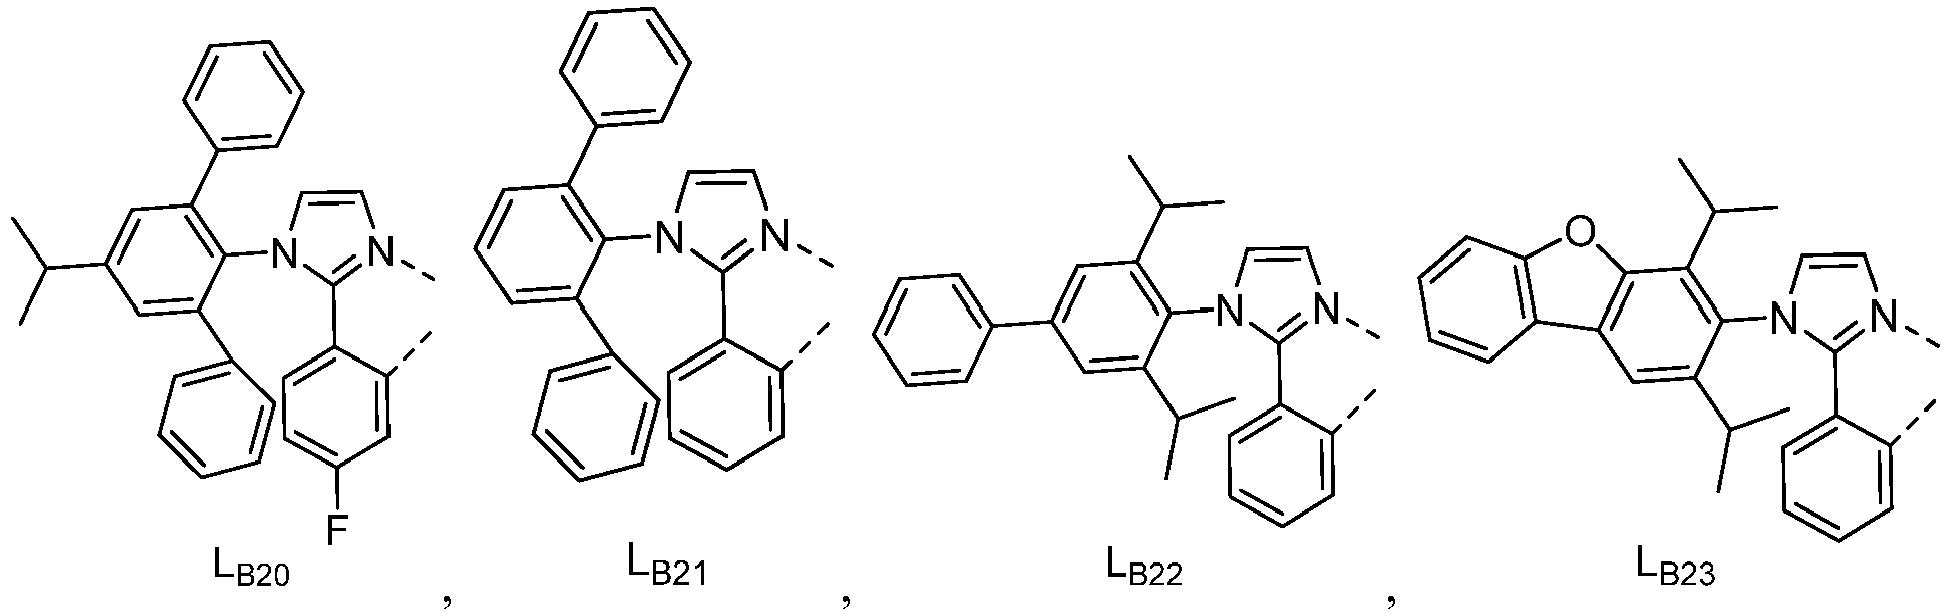 Figure imgb0796